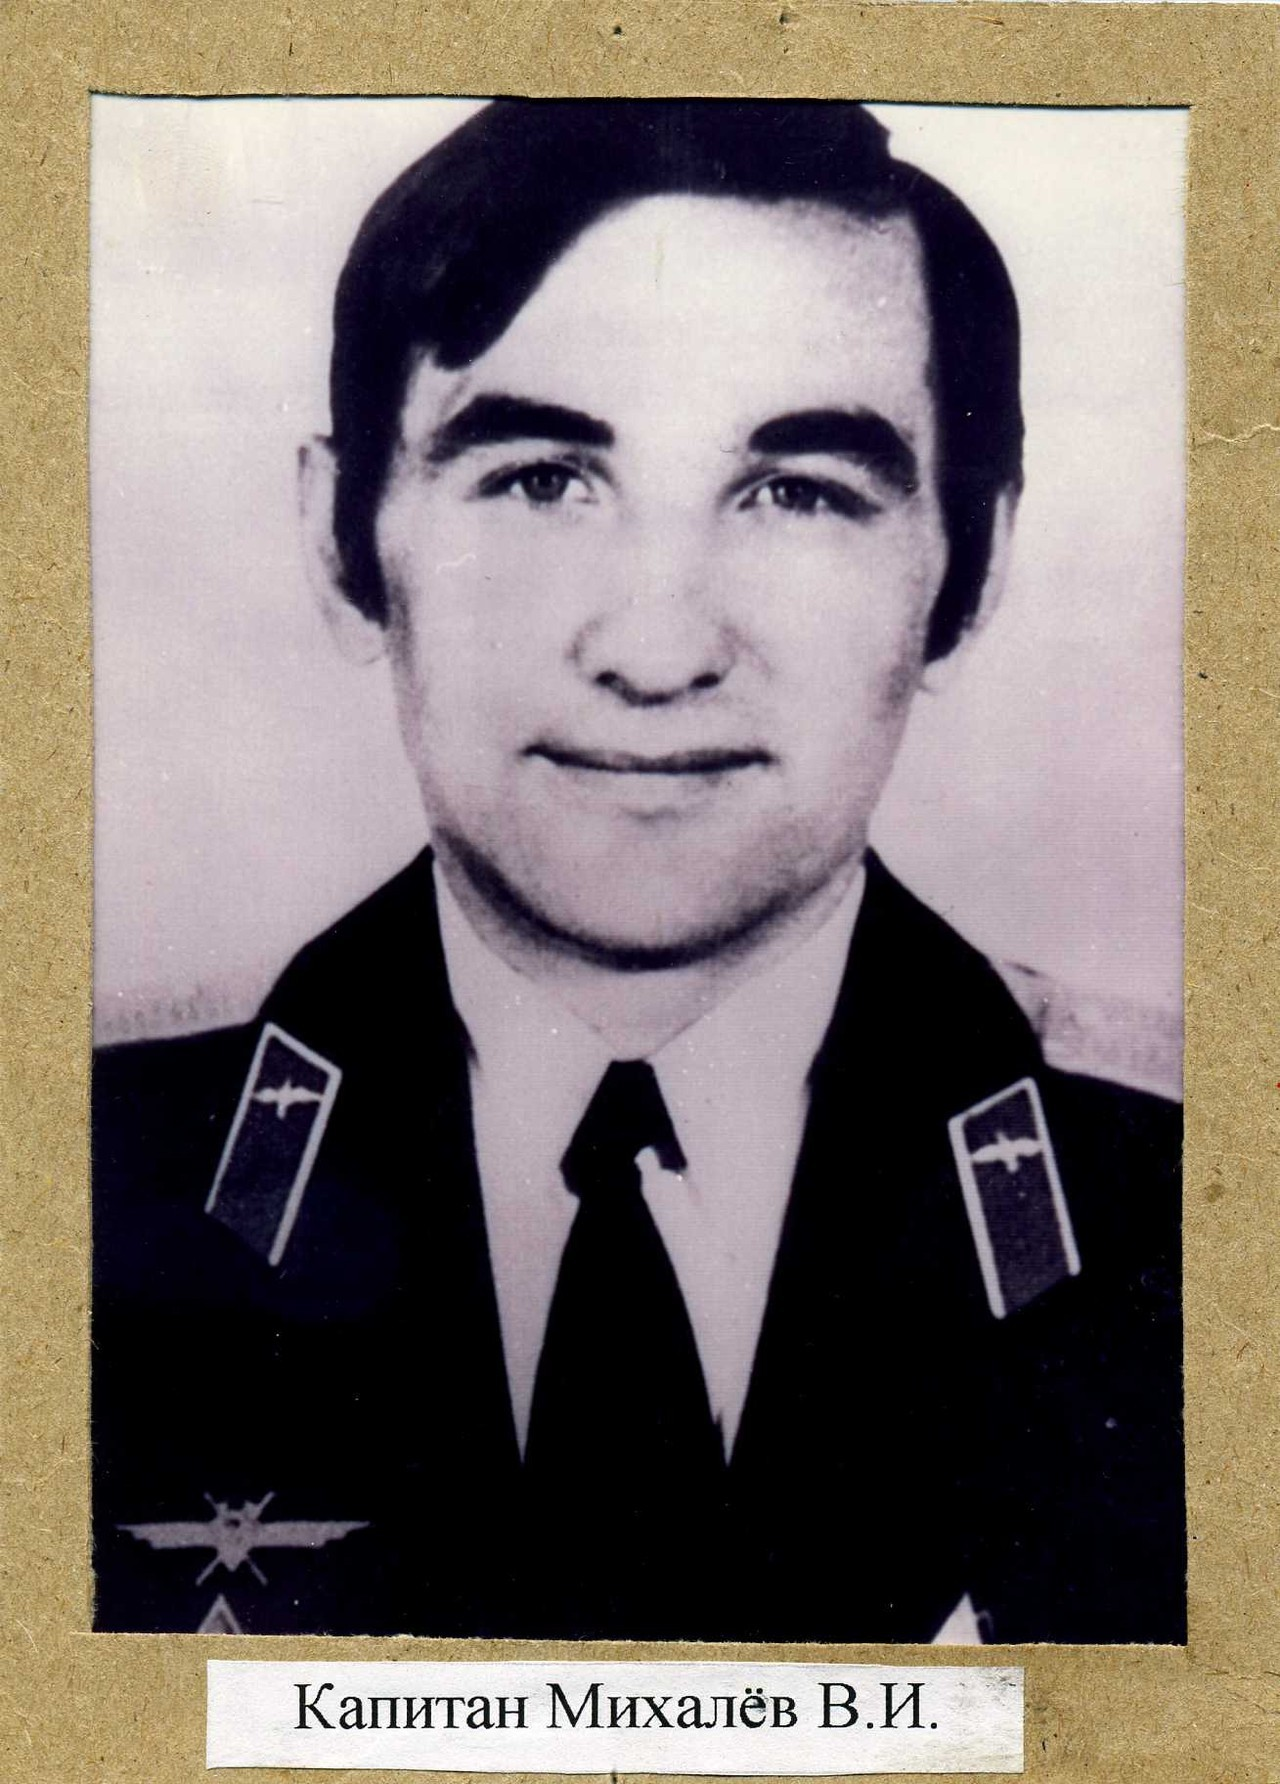 Михалев Виктор Иванович